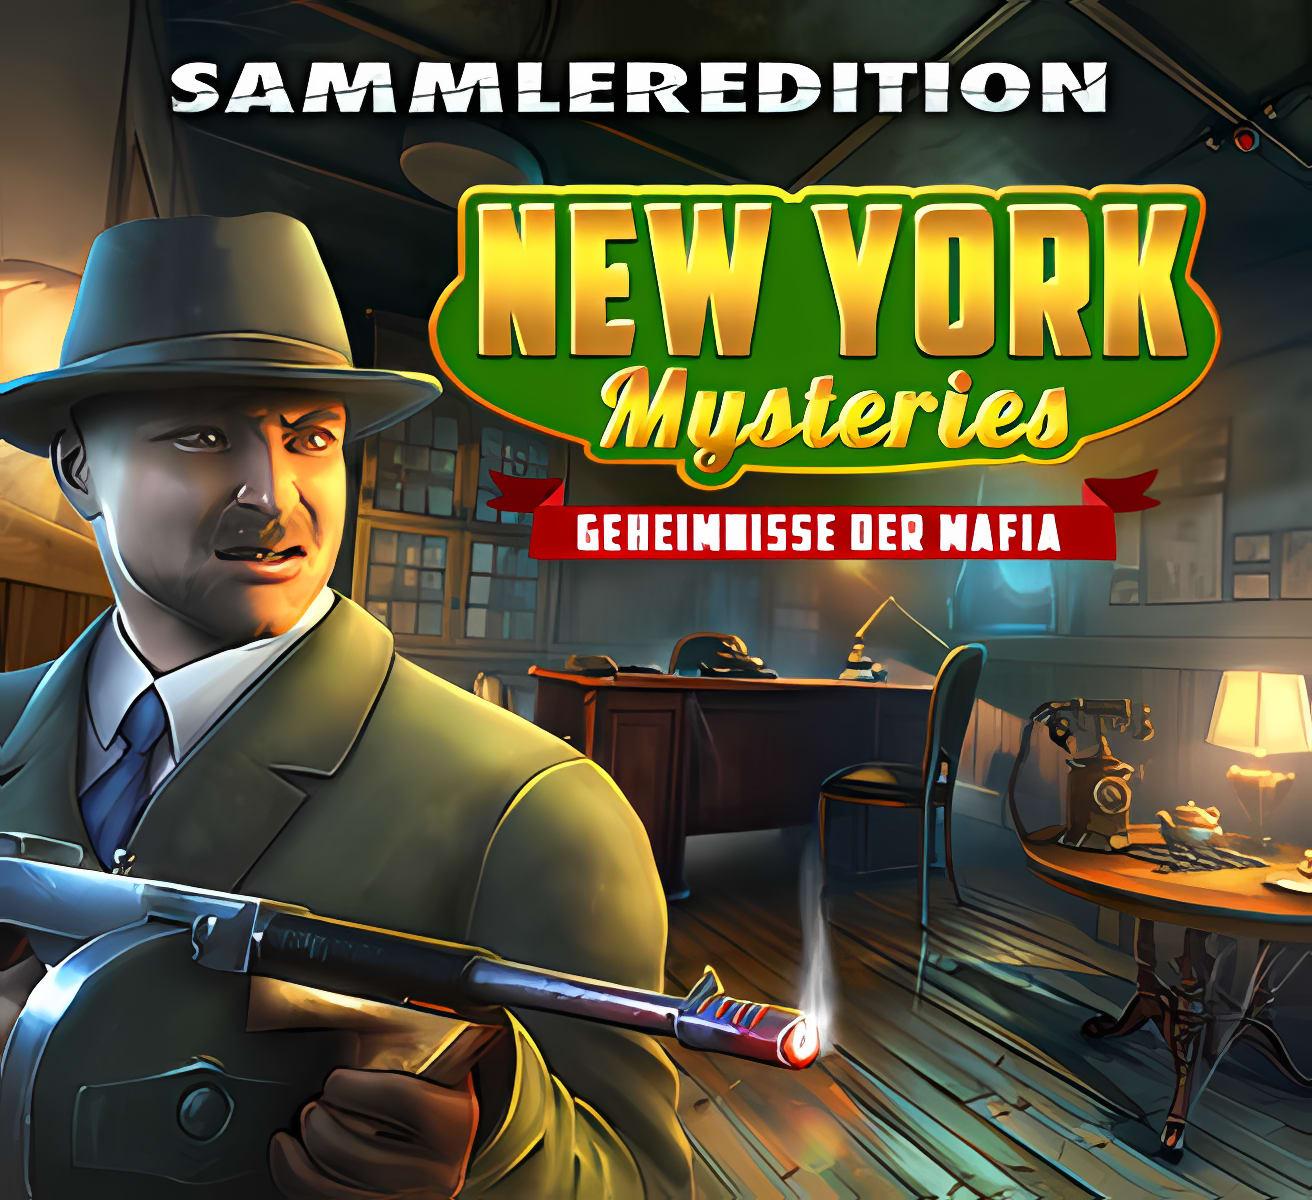 New York Mysteries: Secrets of the Mafia CE